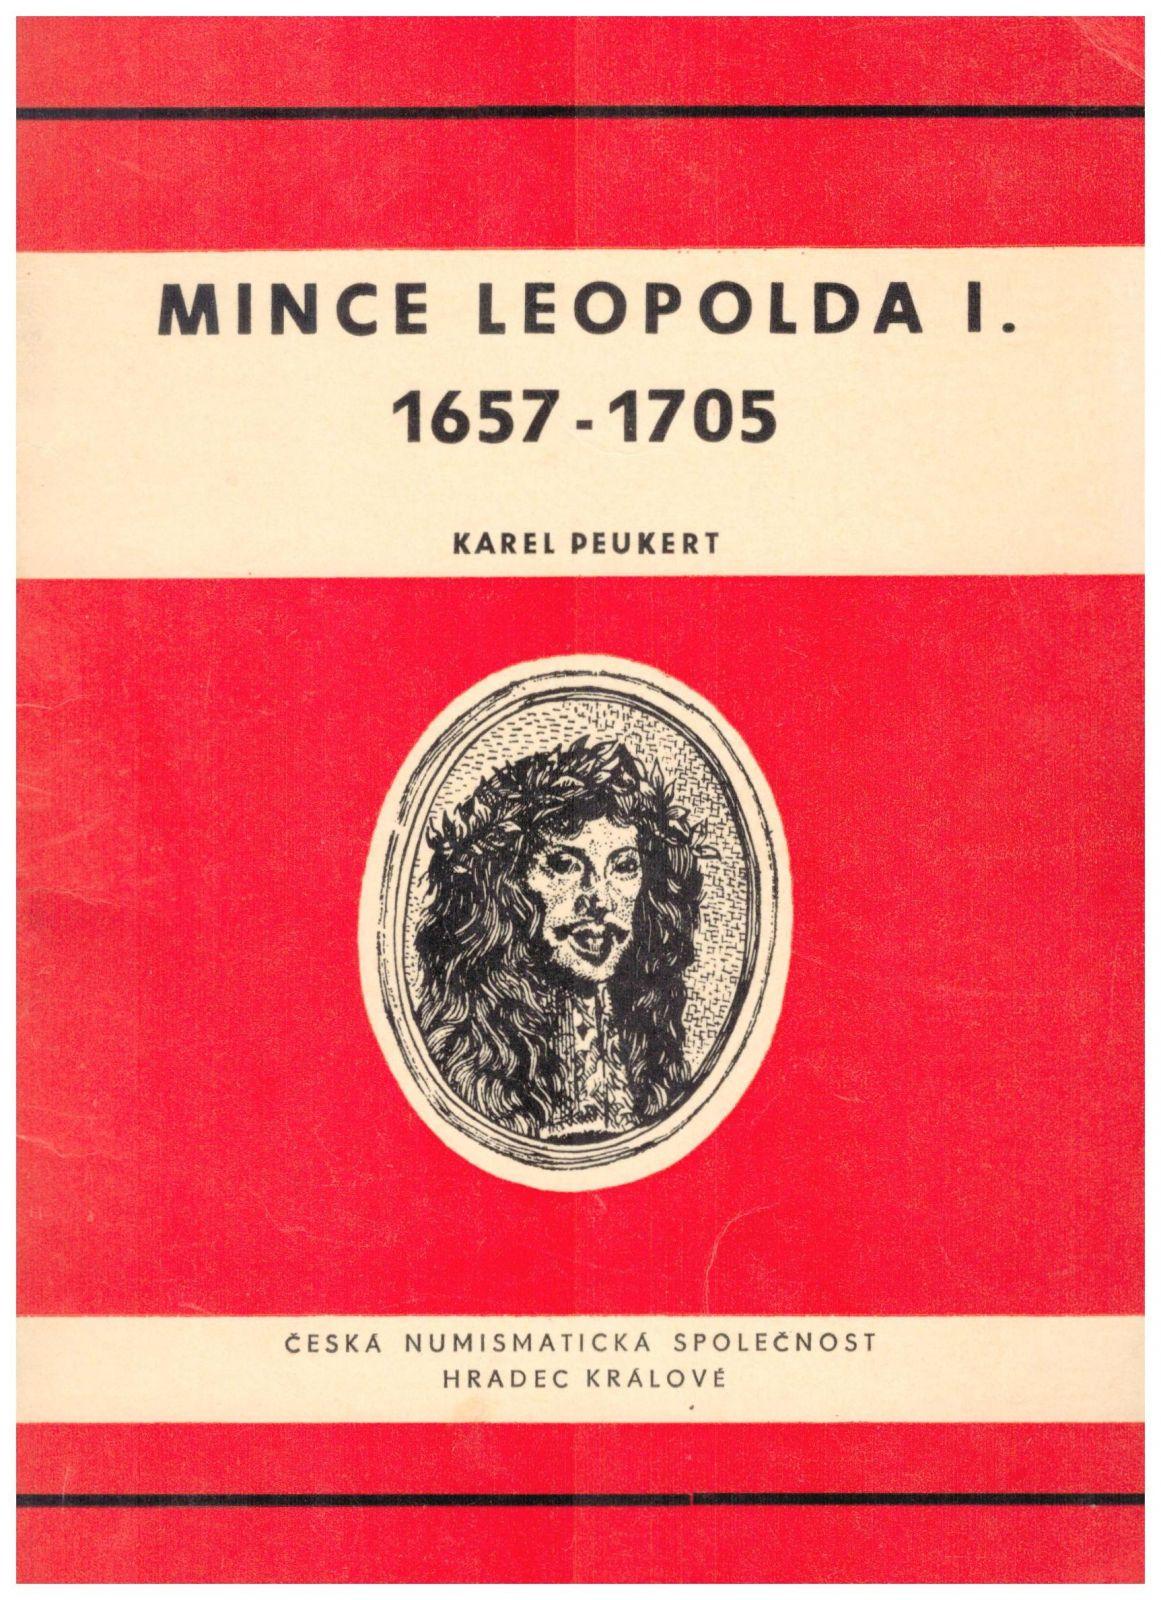 Mince Leopolda I. 1657-1705 (1972), K.Peukert